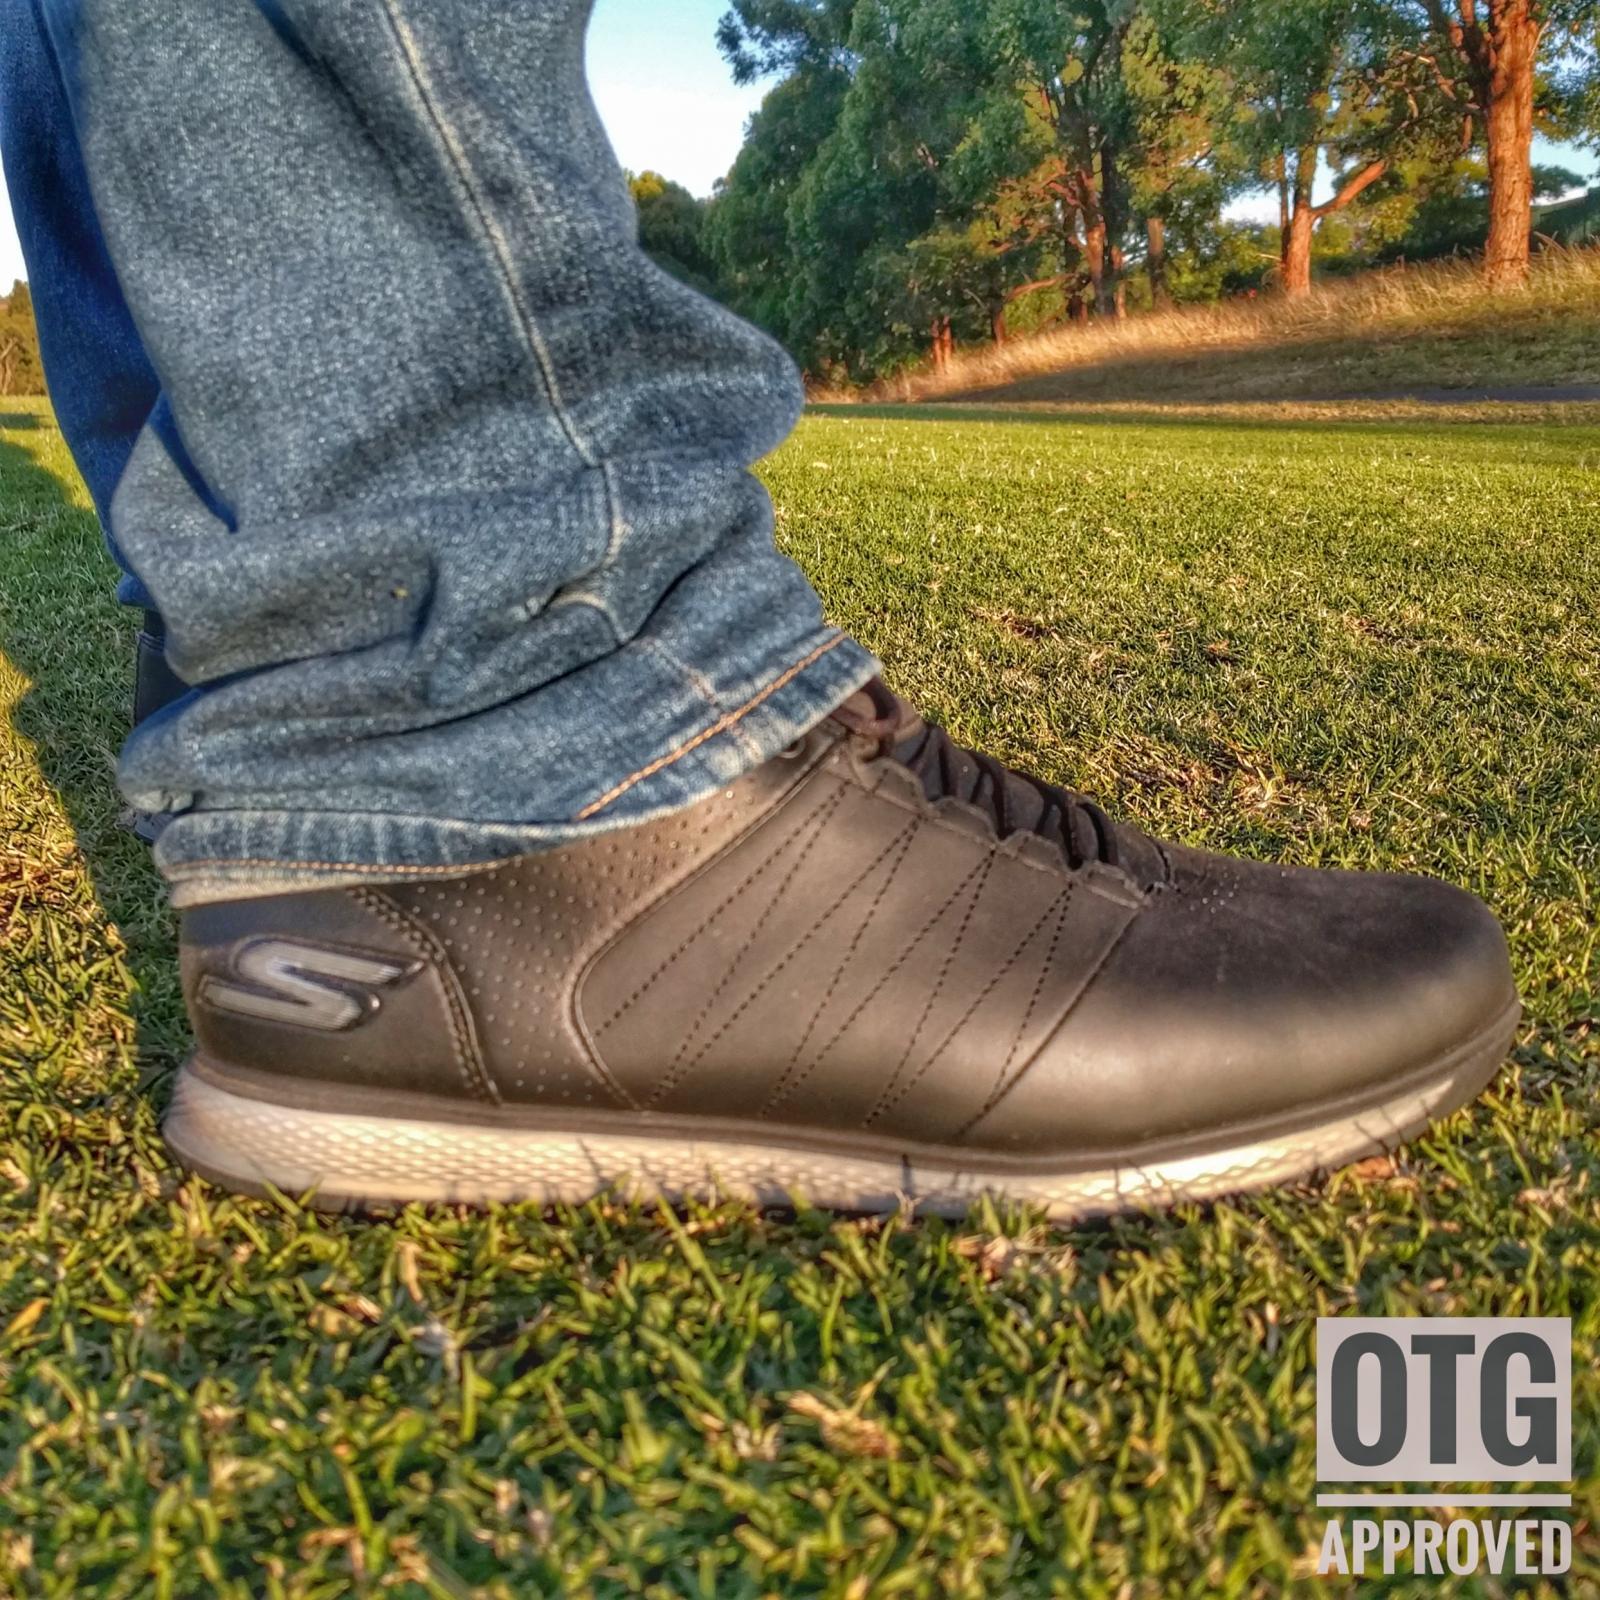 My Golf Spy Shoe Review